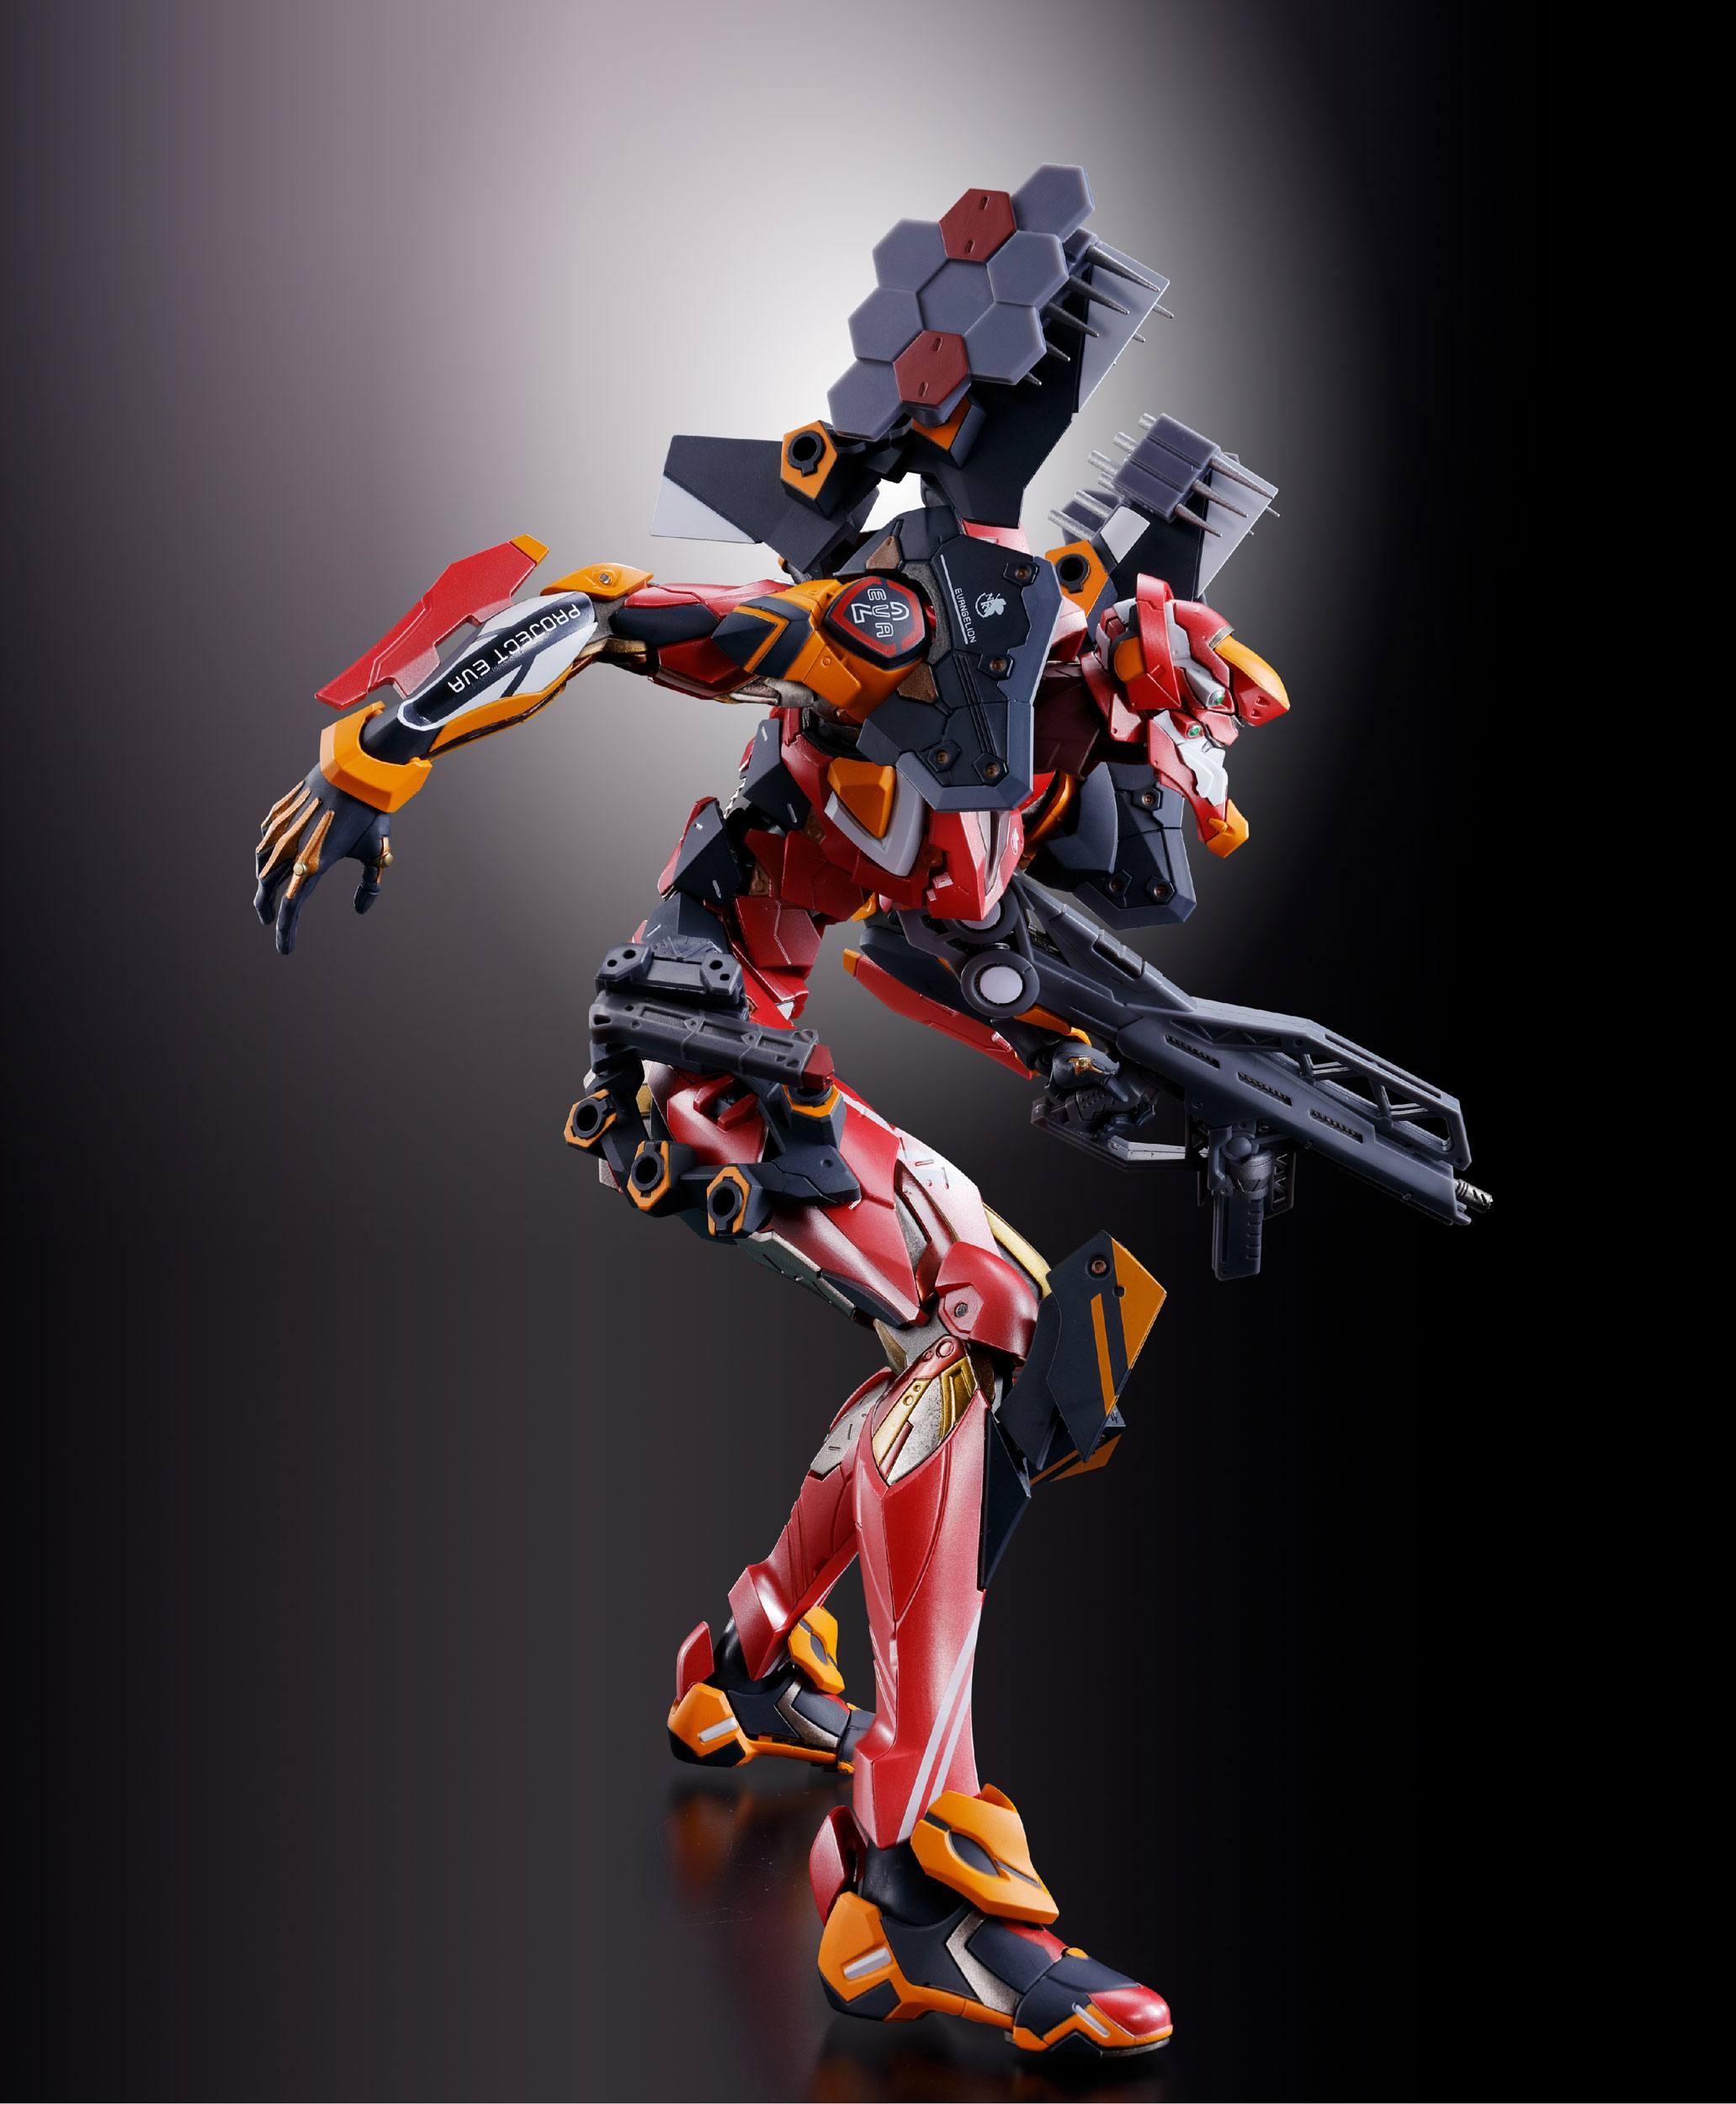 Eva-02 Production Model Real Model 03 Neon Genesis Evangelion Actionfrom New